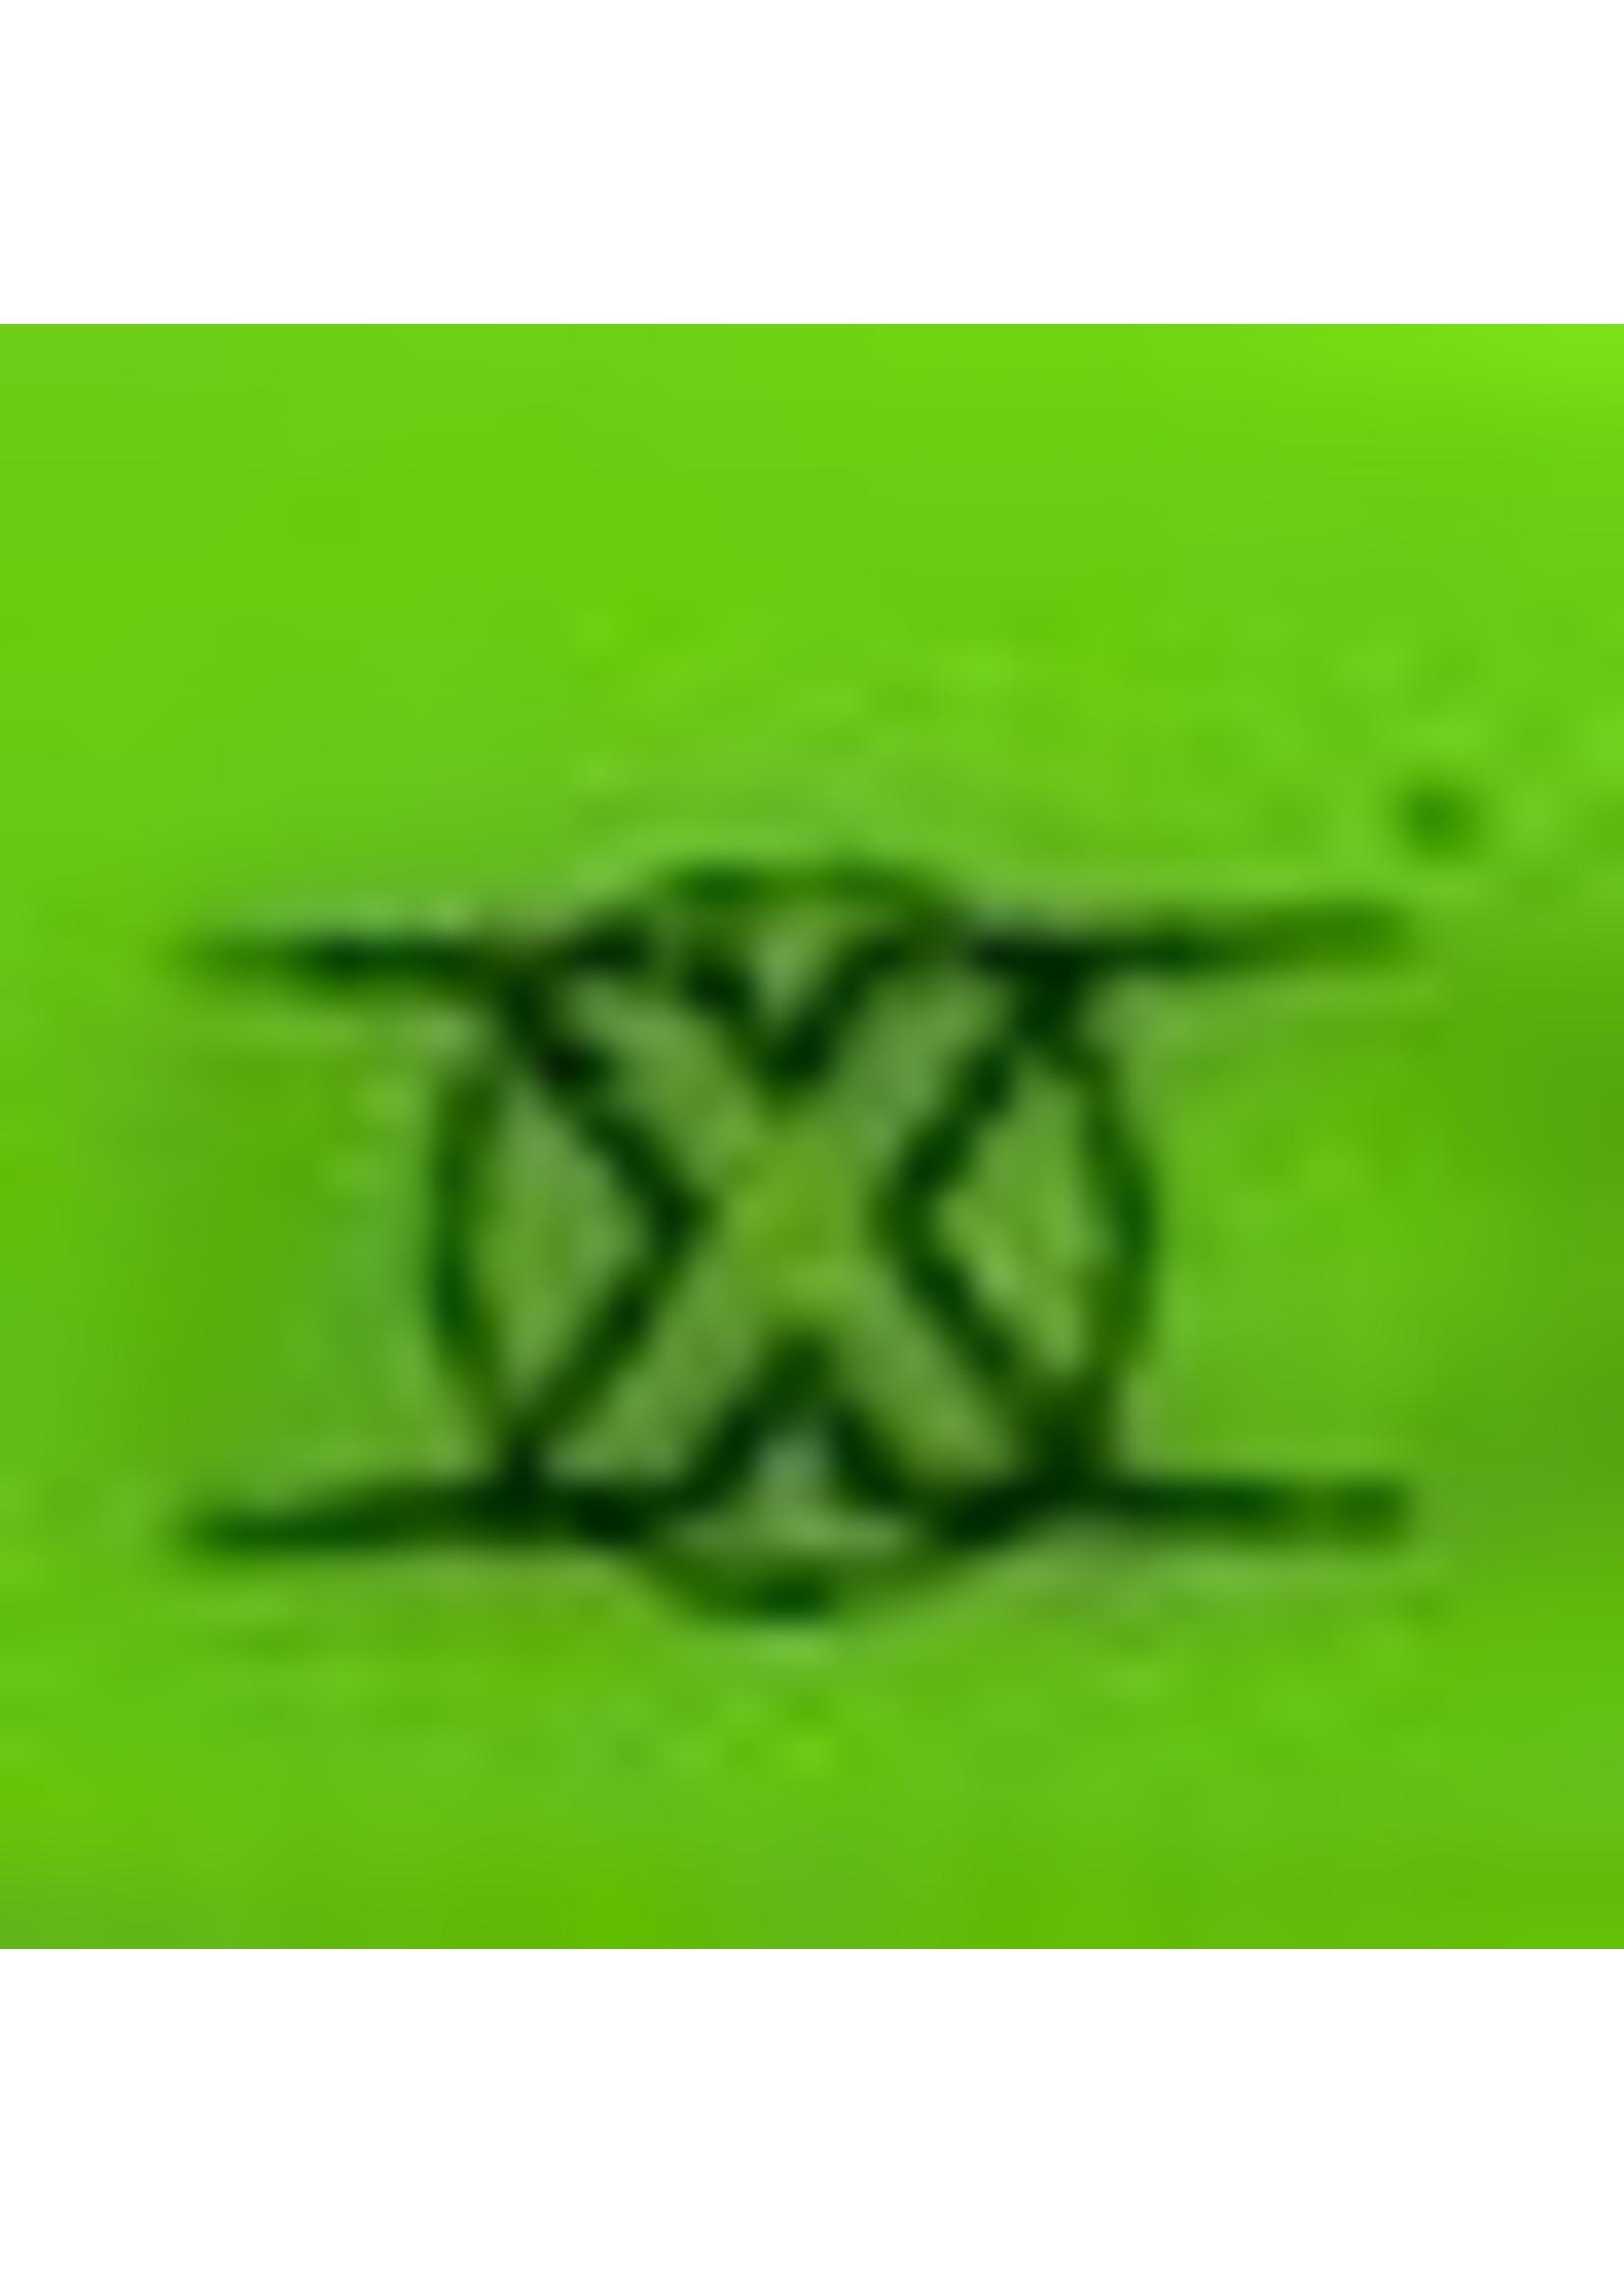 Bohning Bohning X Vanes 100pk